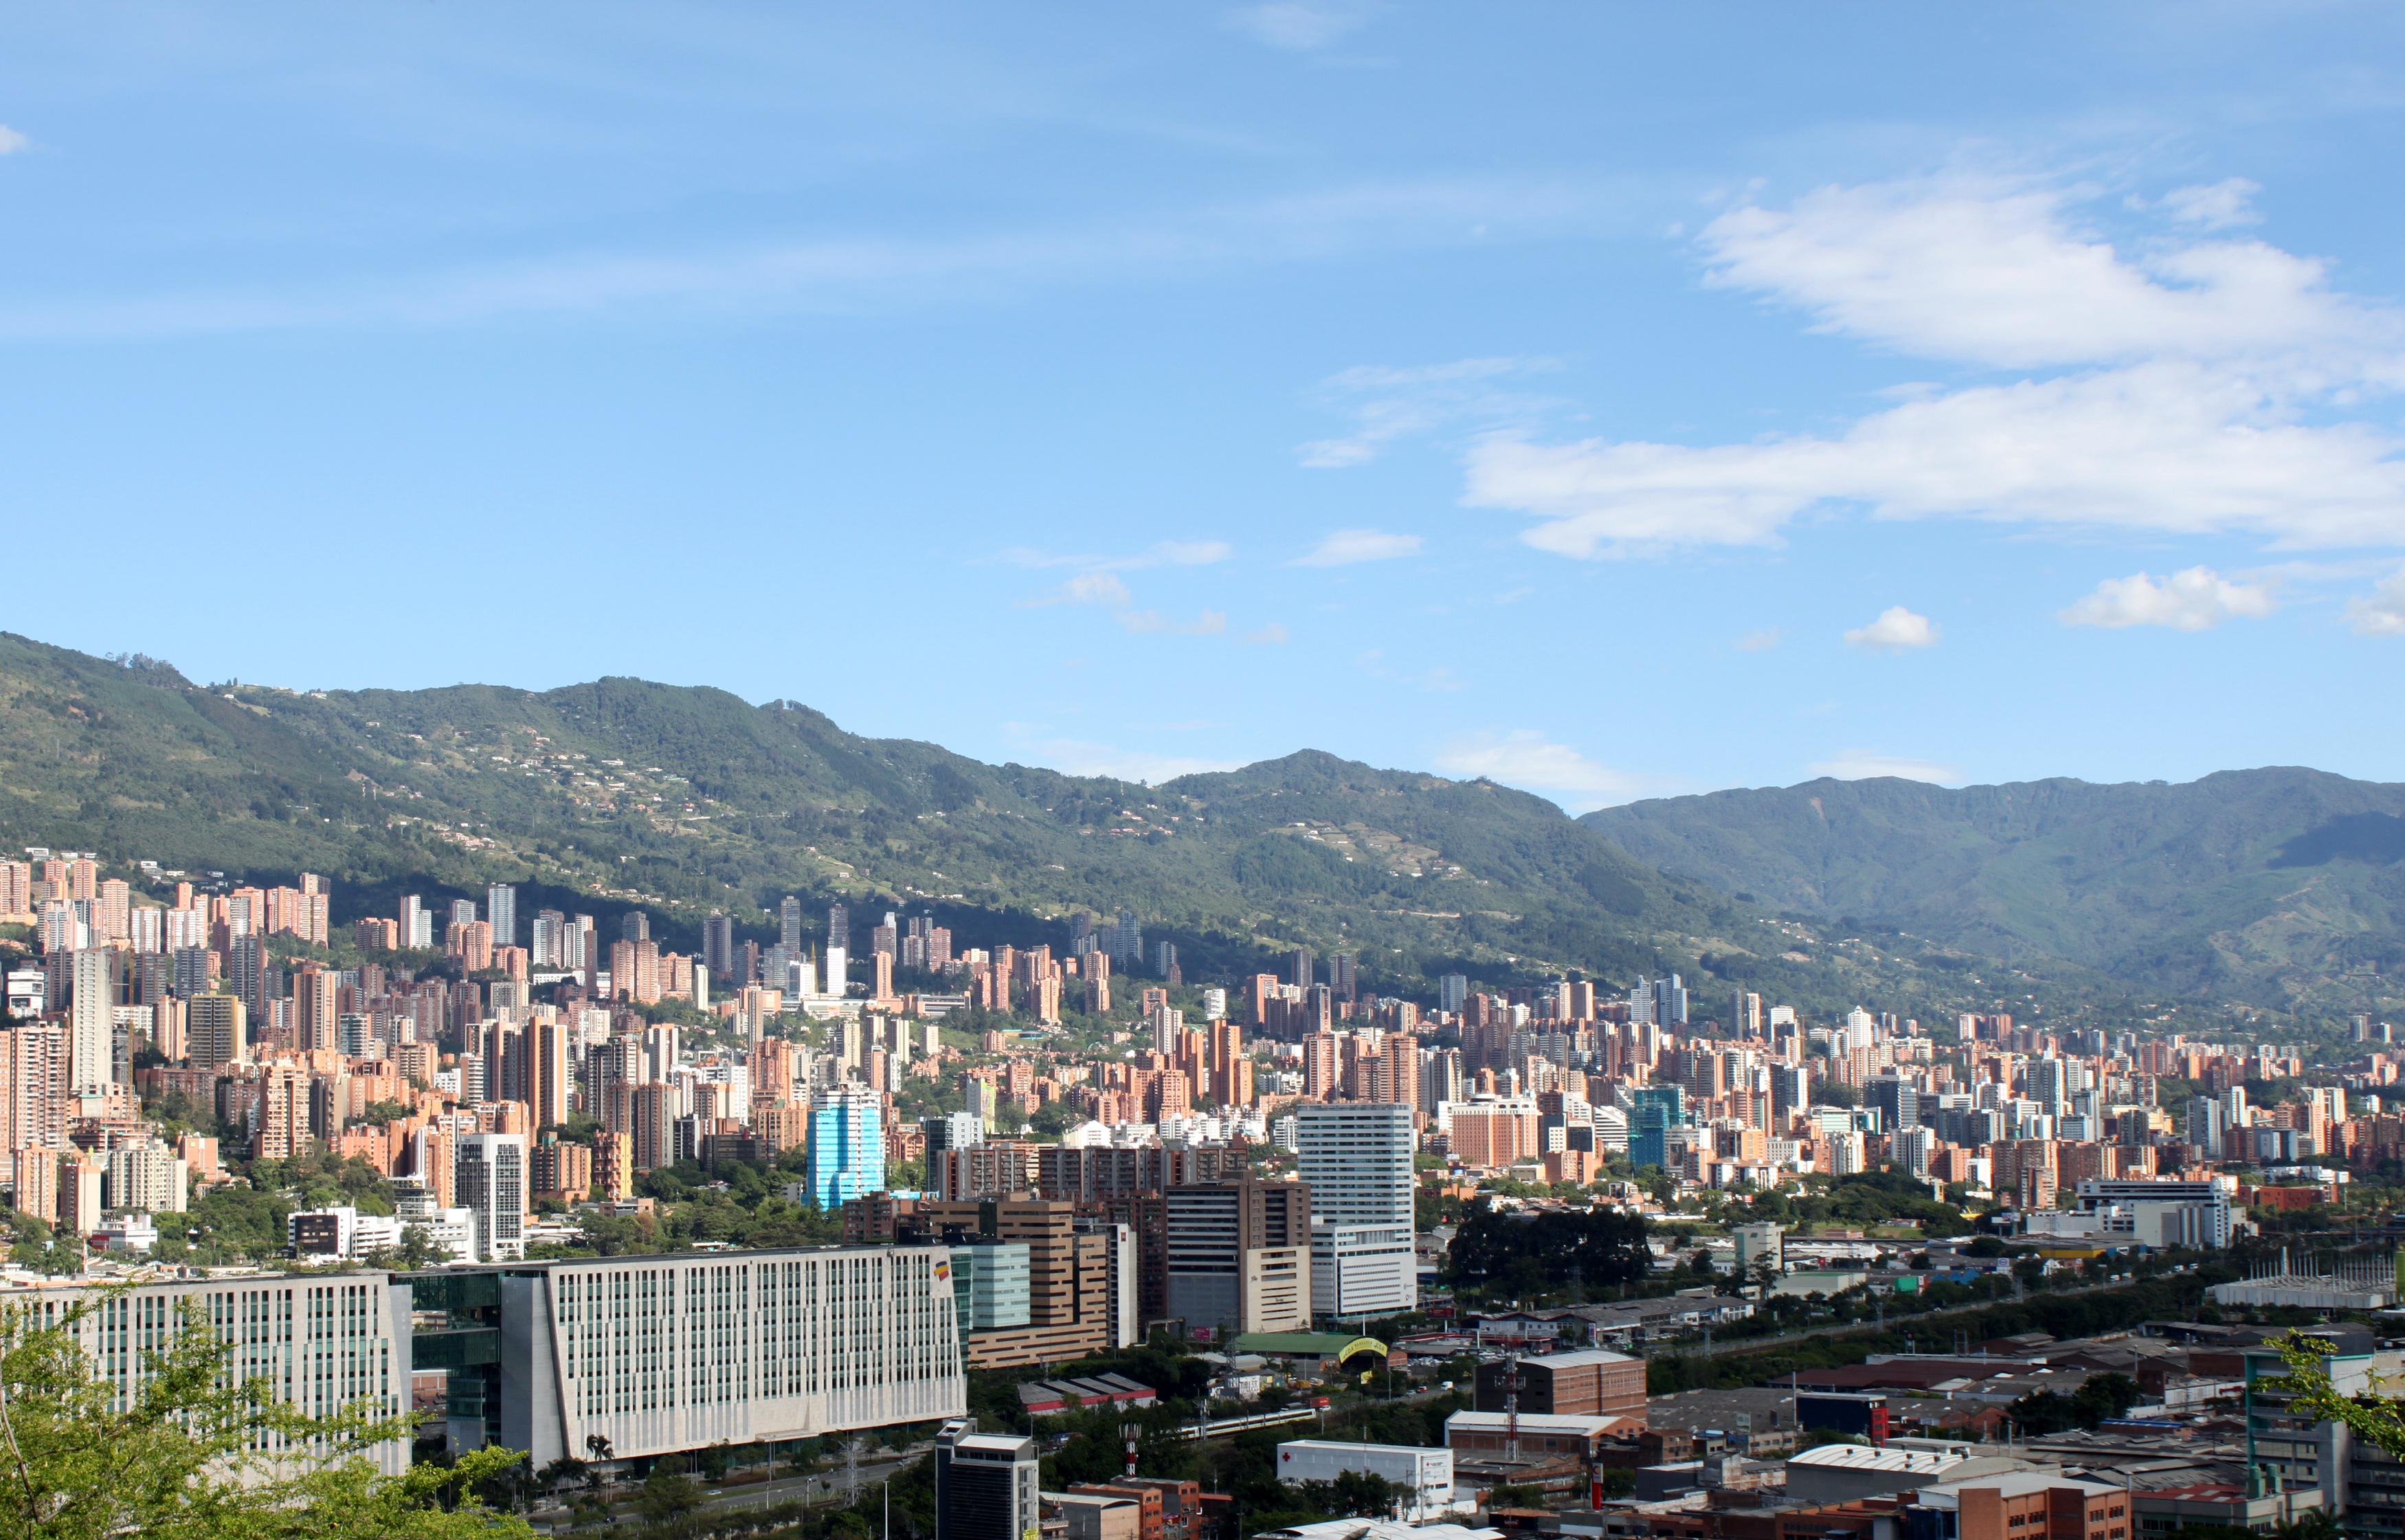 Medellin, Shutterstock